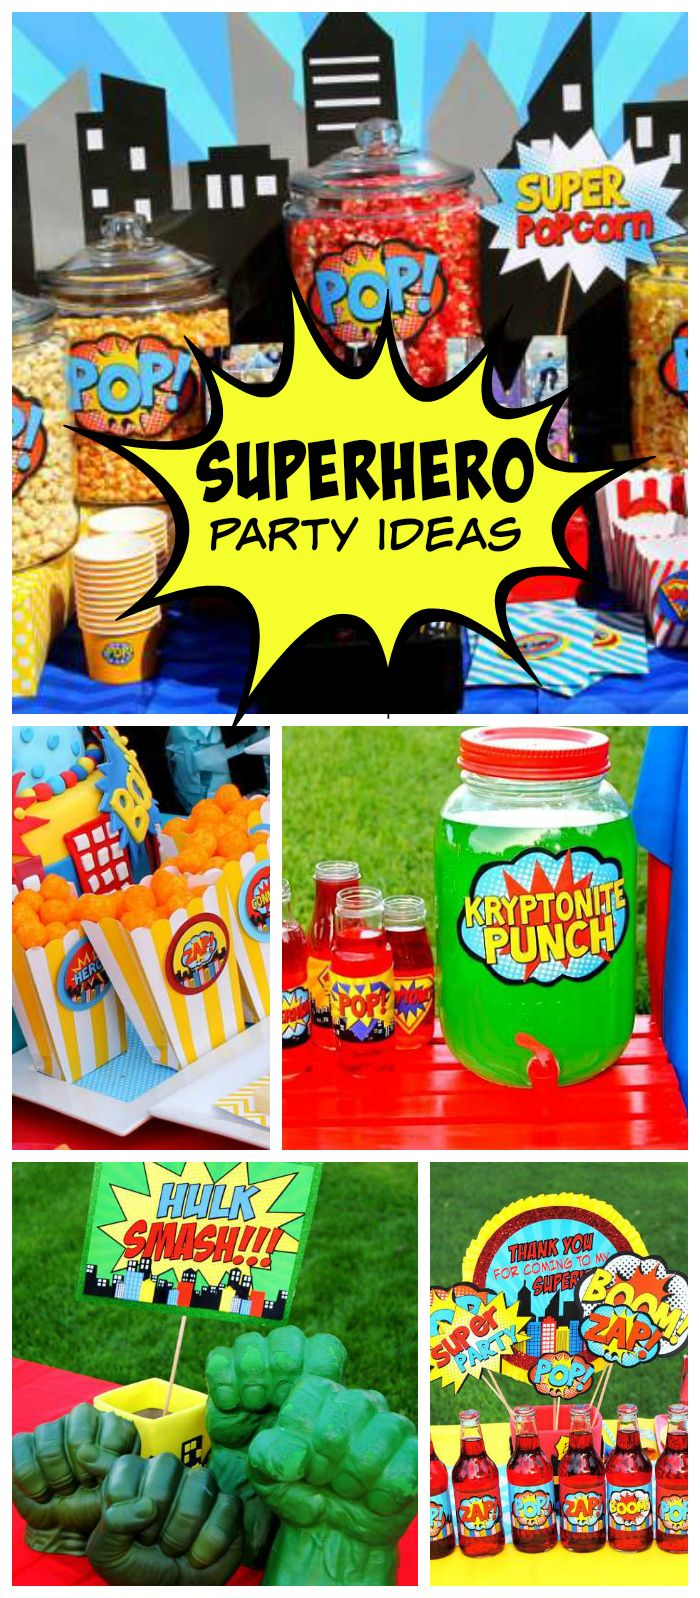 Best 25+ Superhero party decorations ideas on Pinterest | Avengers ...